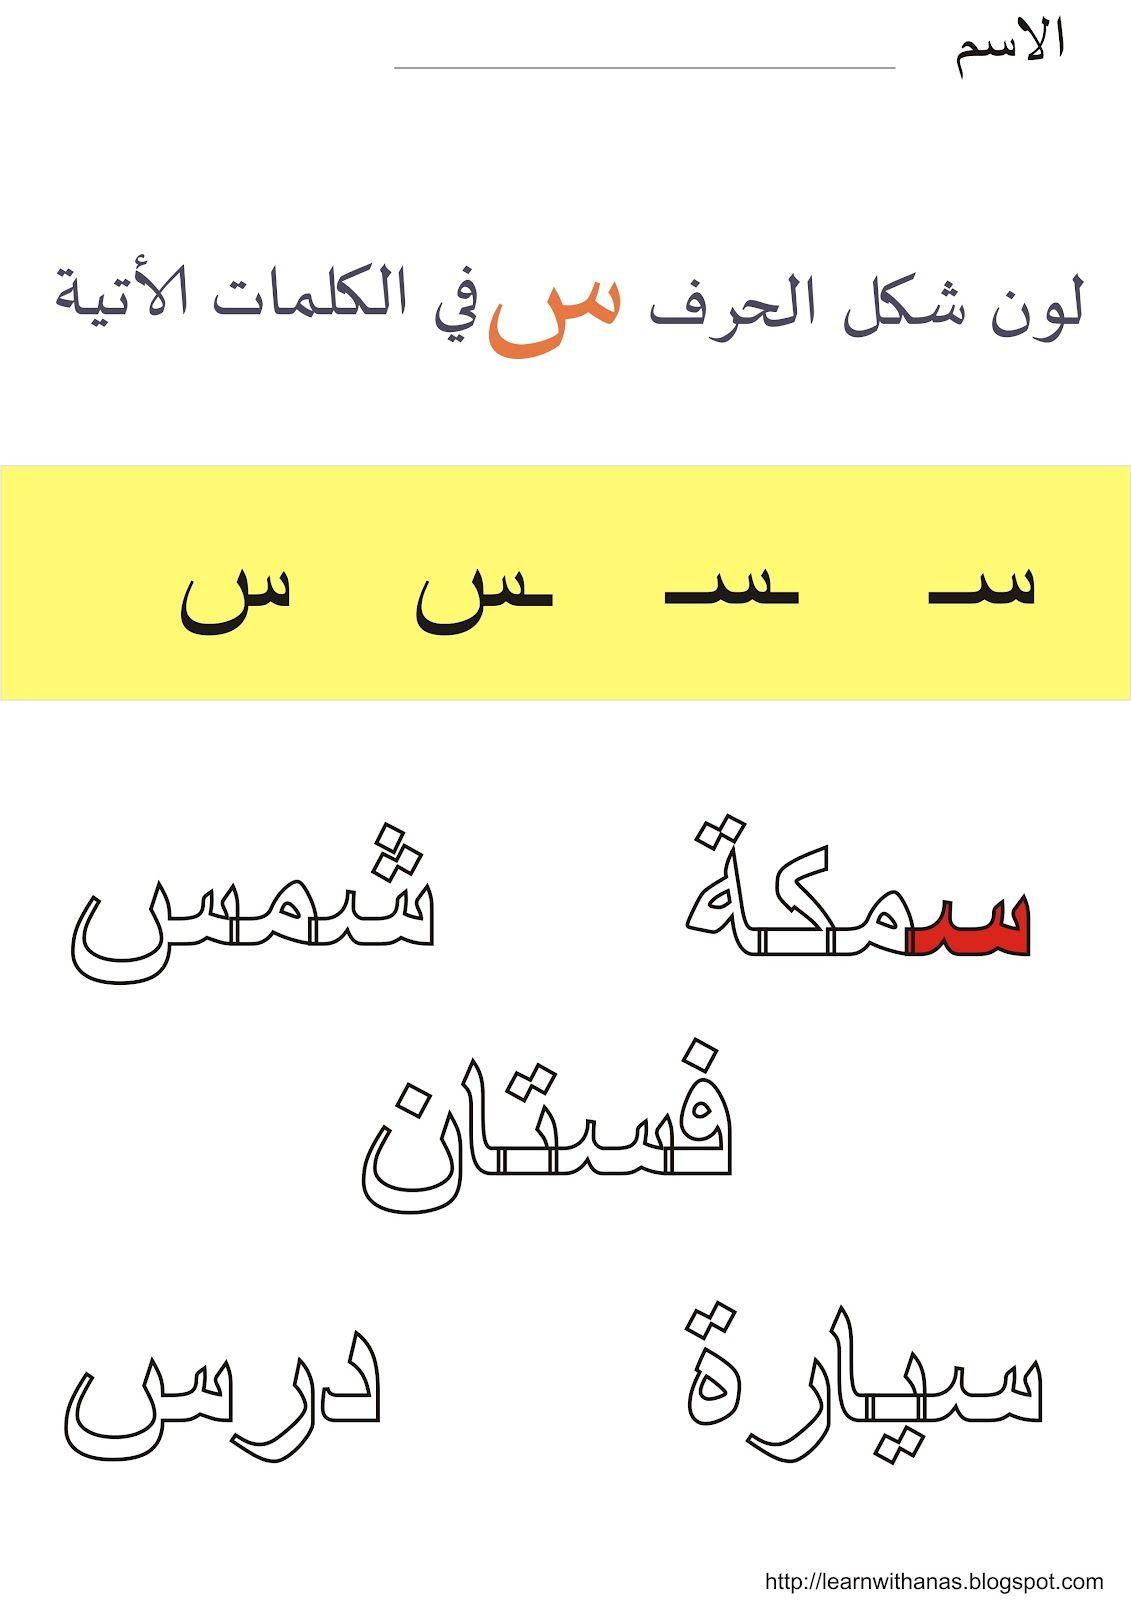 Shakel El 7aref Seen